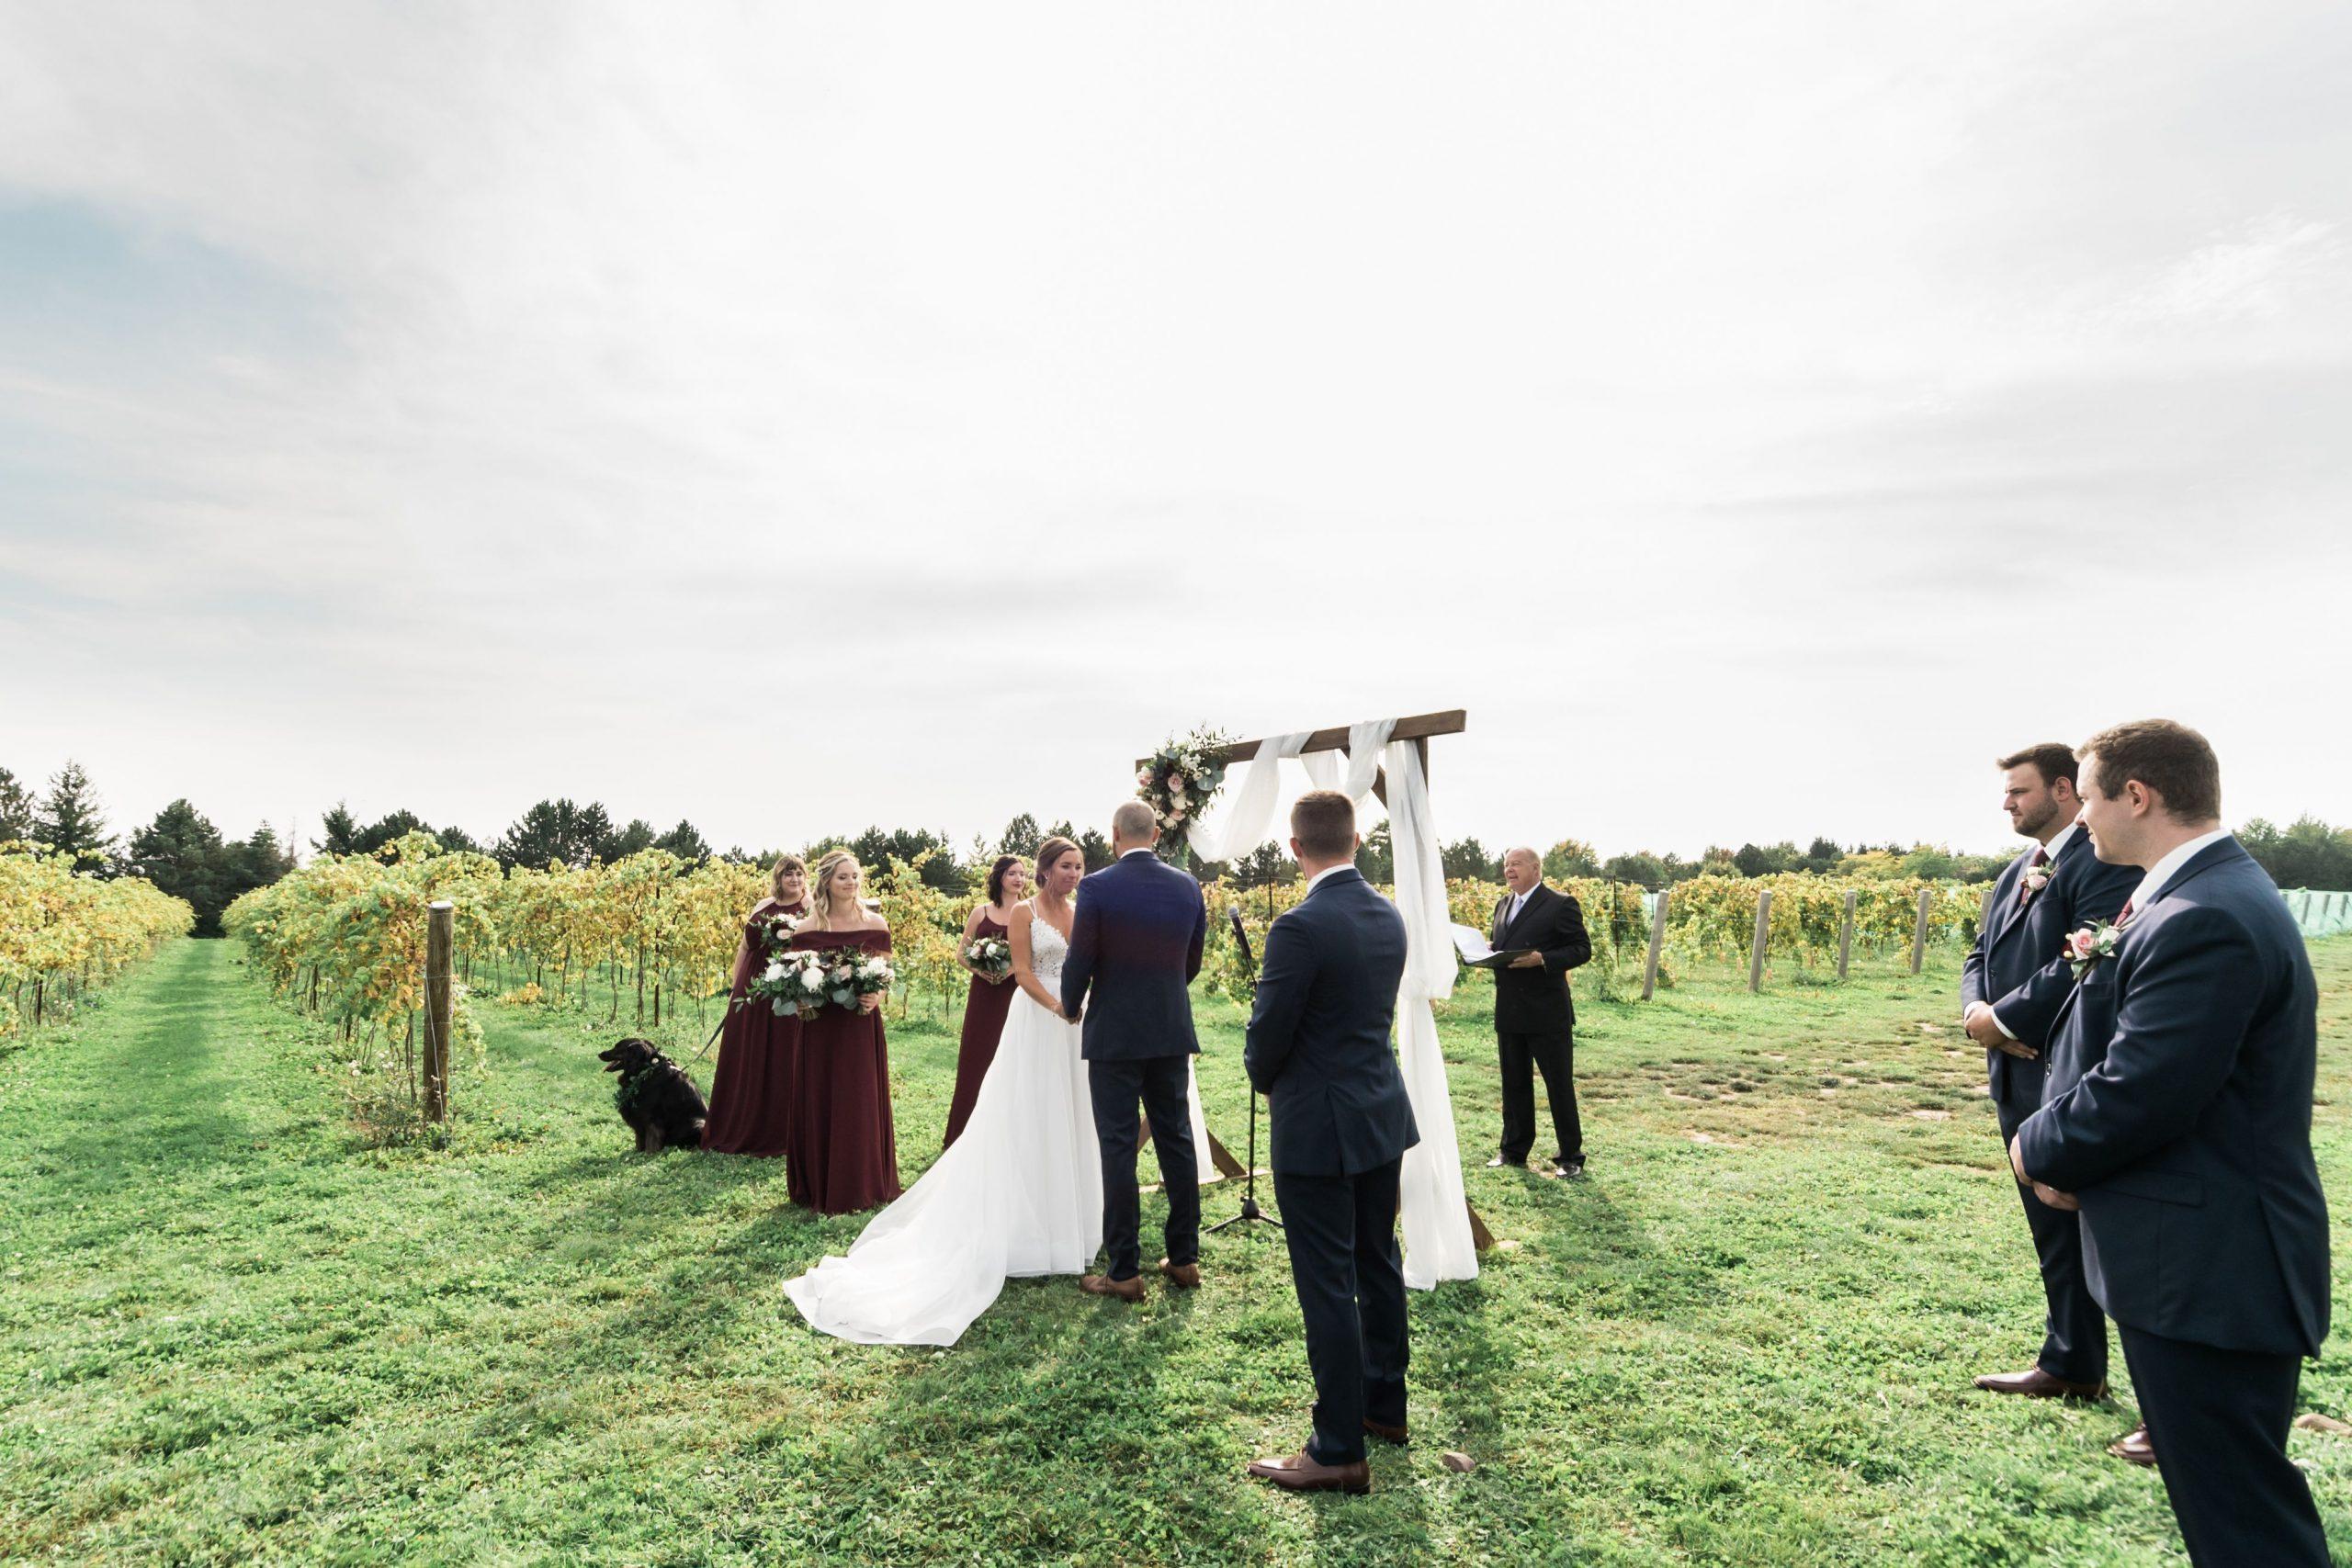 ceremony at Hessenland Inn & Schatz Winery